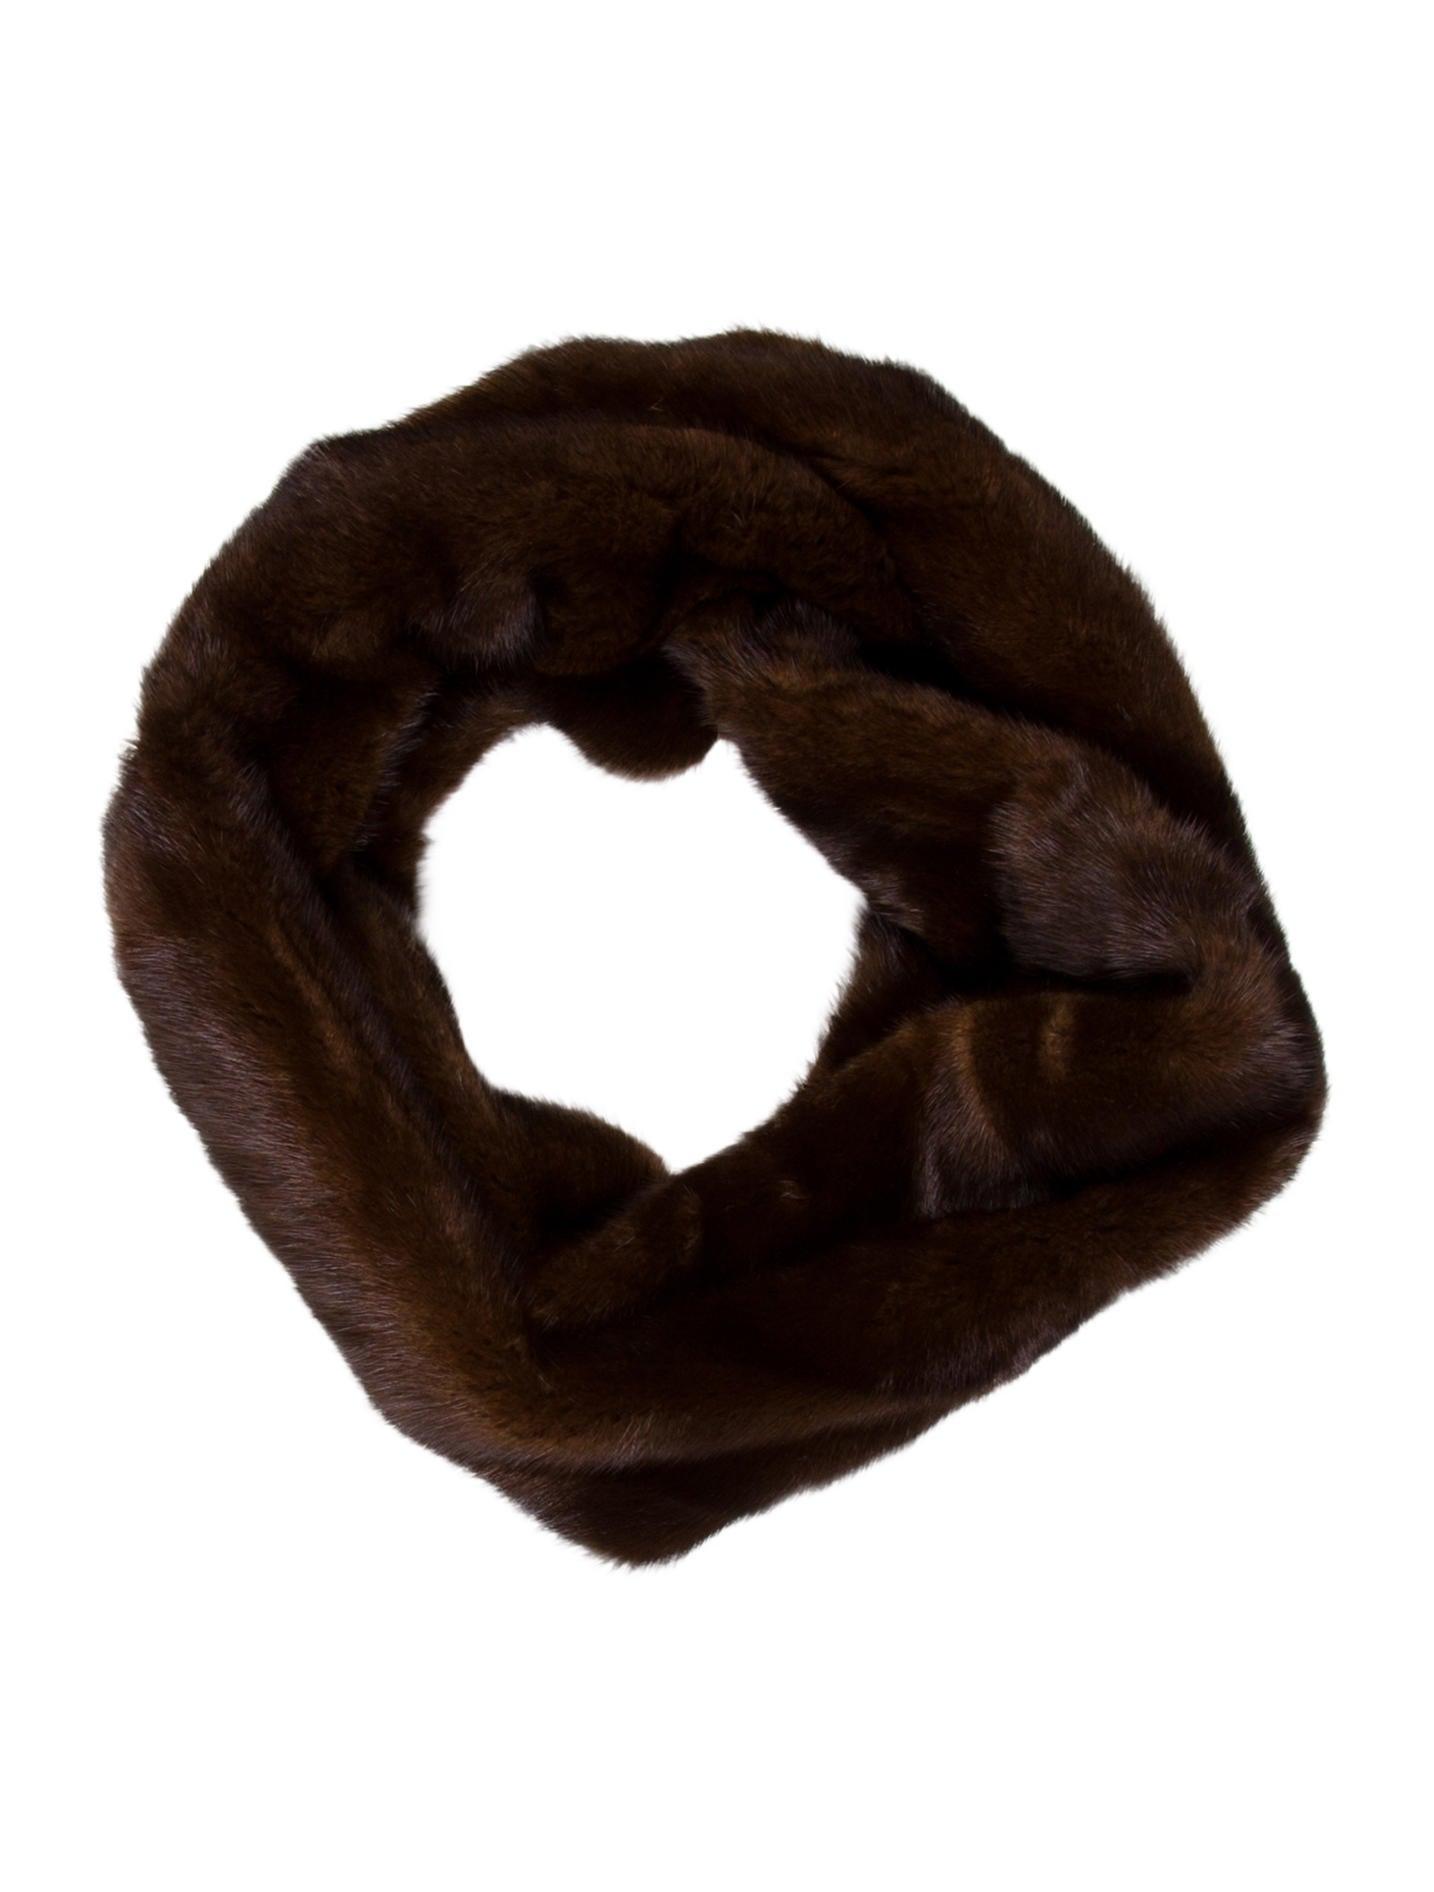 Carolina Herrera Mink Fur Infinity Scarf w Tags  : CAO315651enlarged from www.therealreal.com size 1434 x 1892 jpeg 117kB